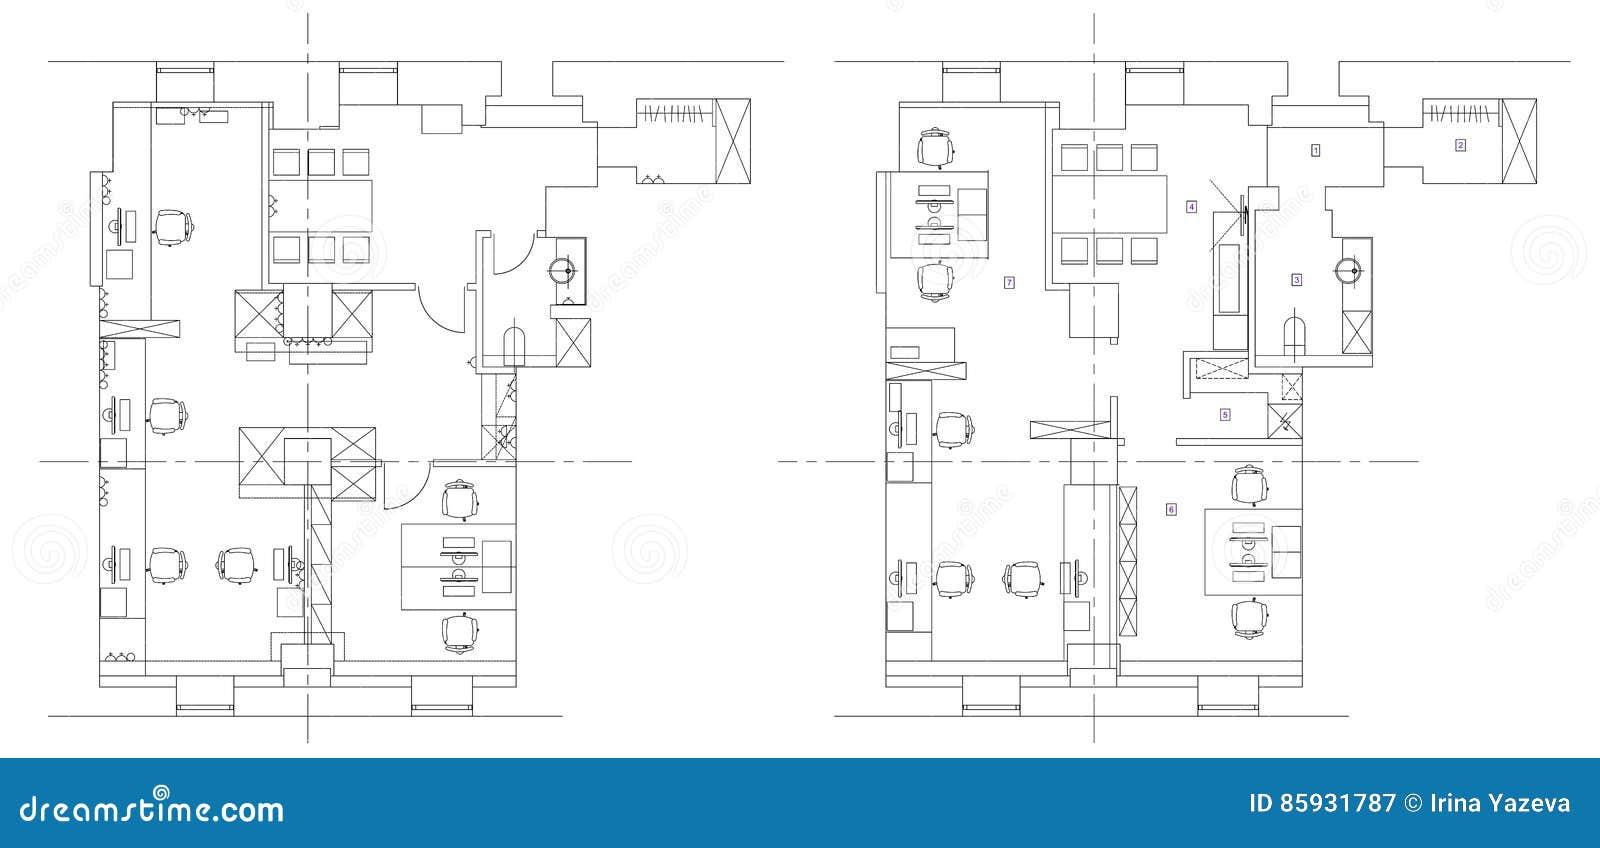 Office Furniture Symbols For Floor Plans: Standard Office Furniture Symbols Set Stock Vector